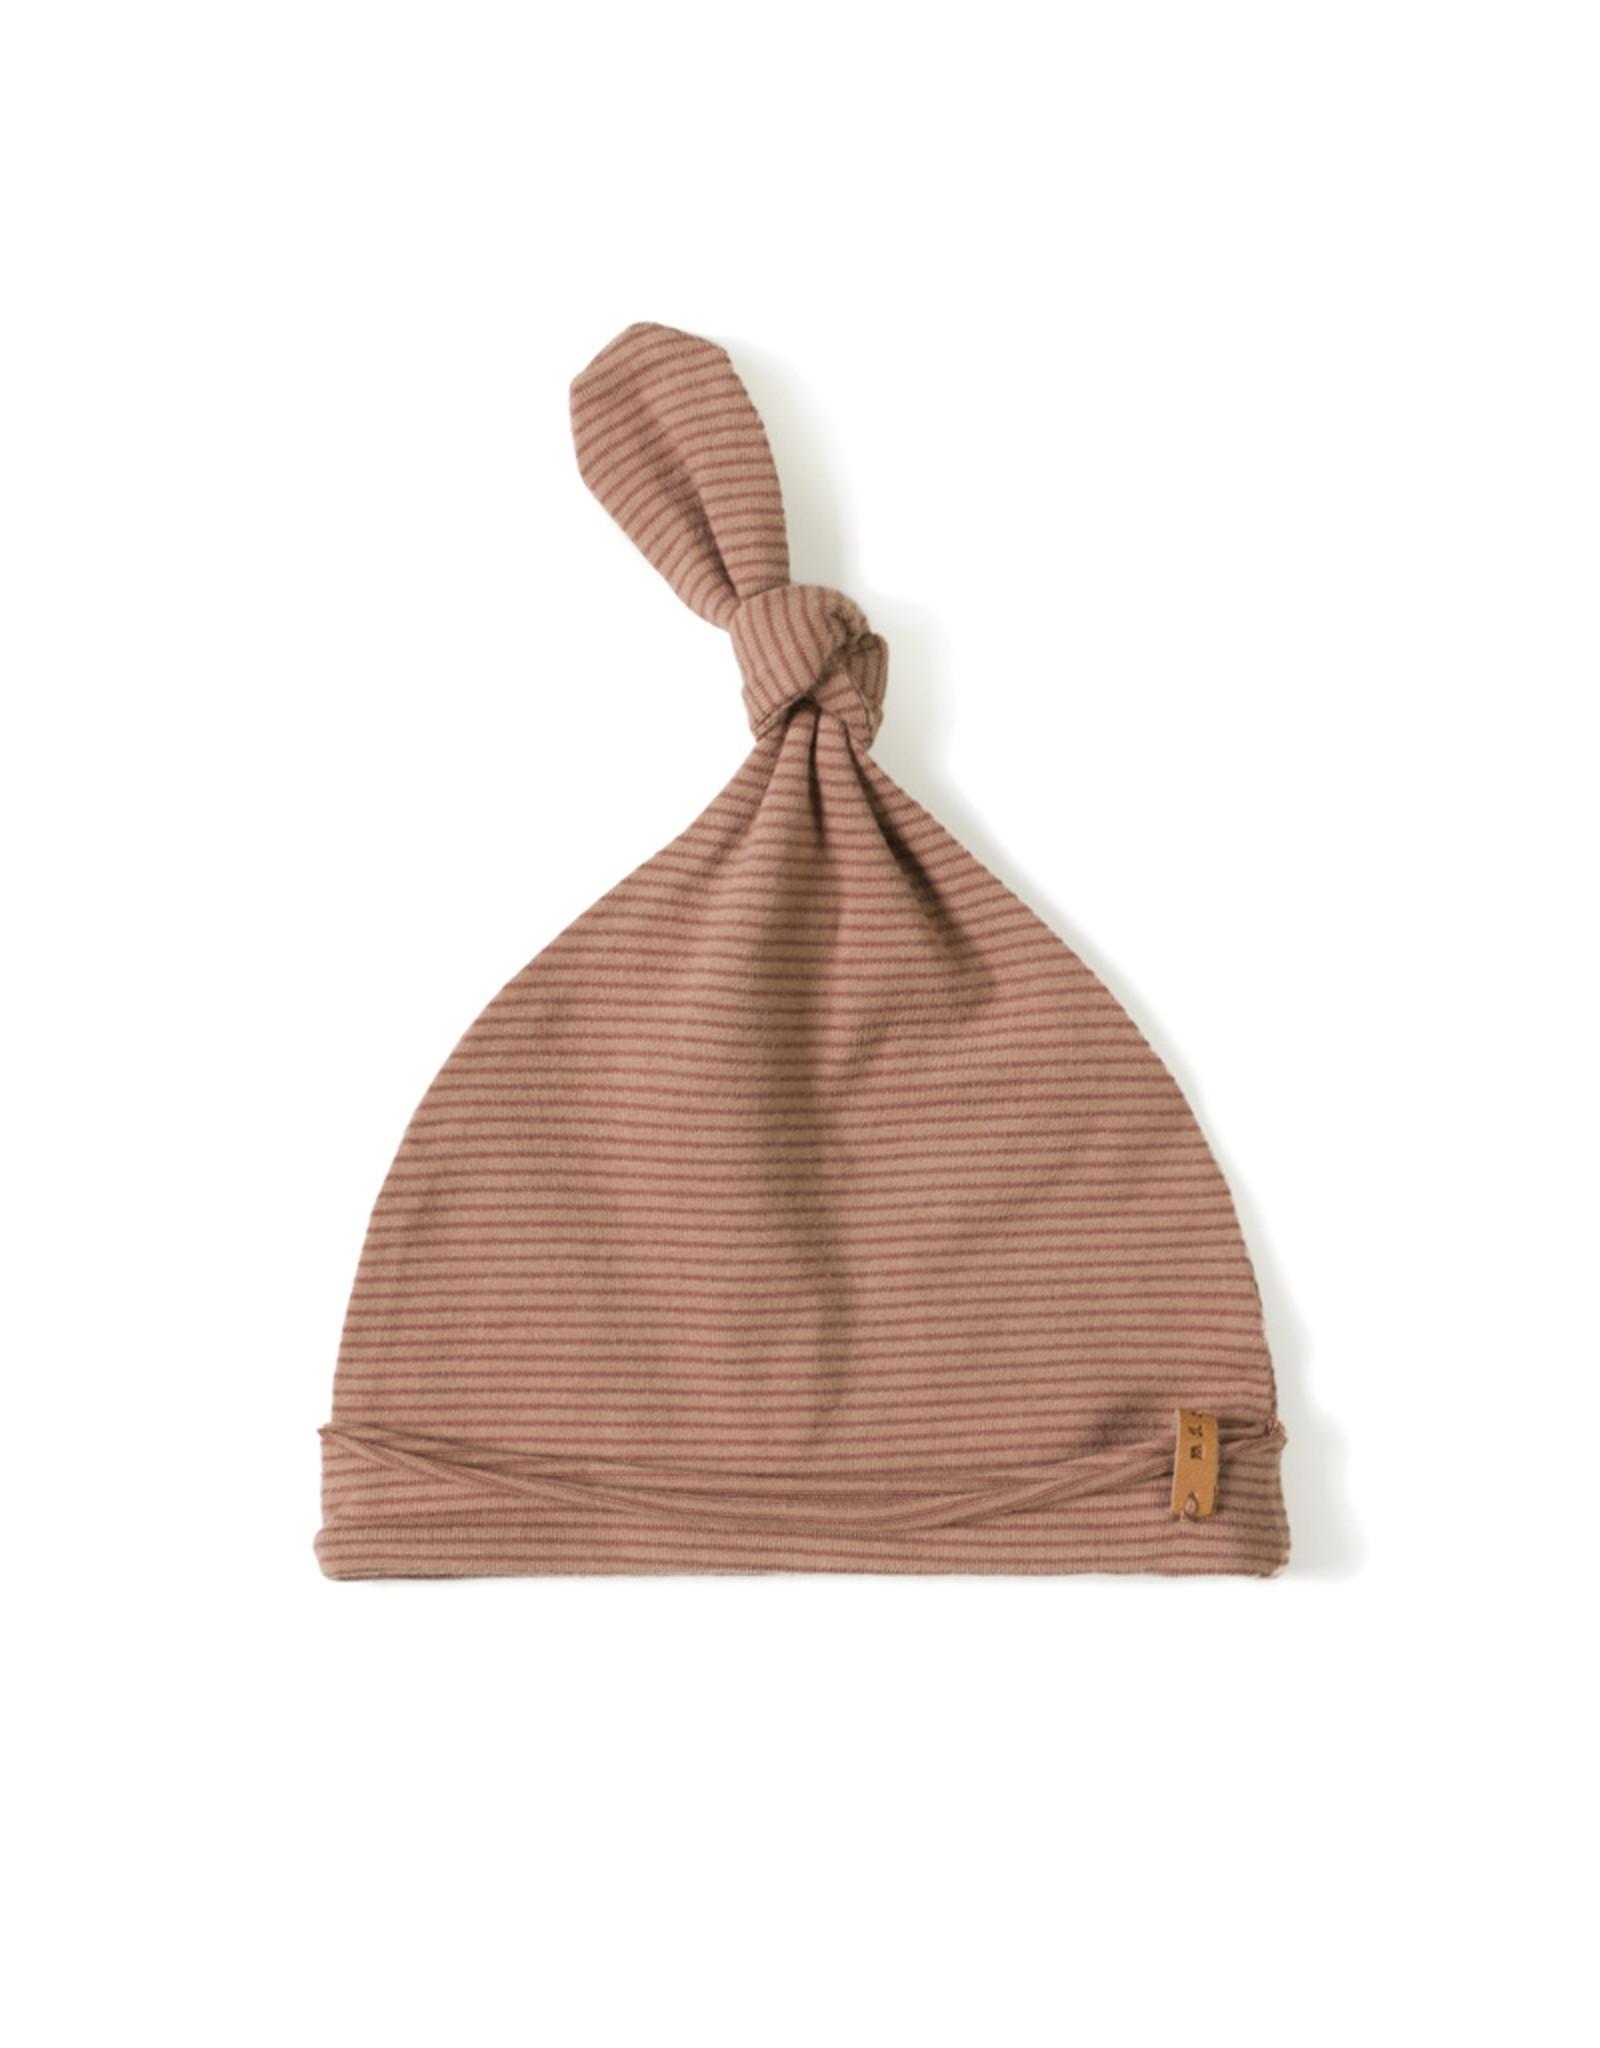 Nixnut Bonnet - Jam